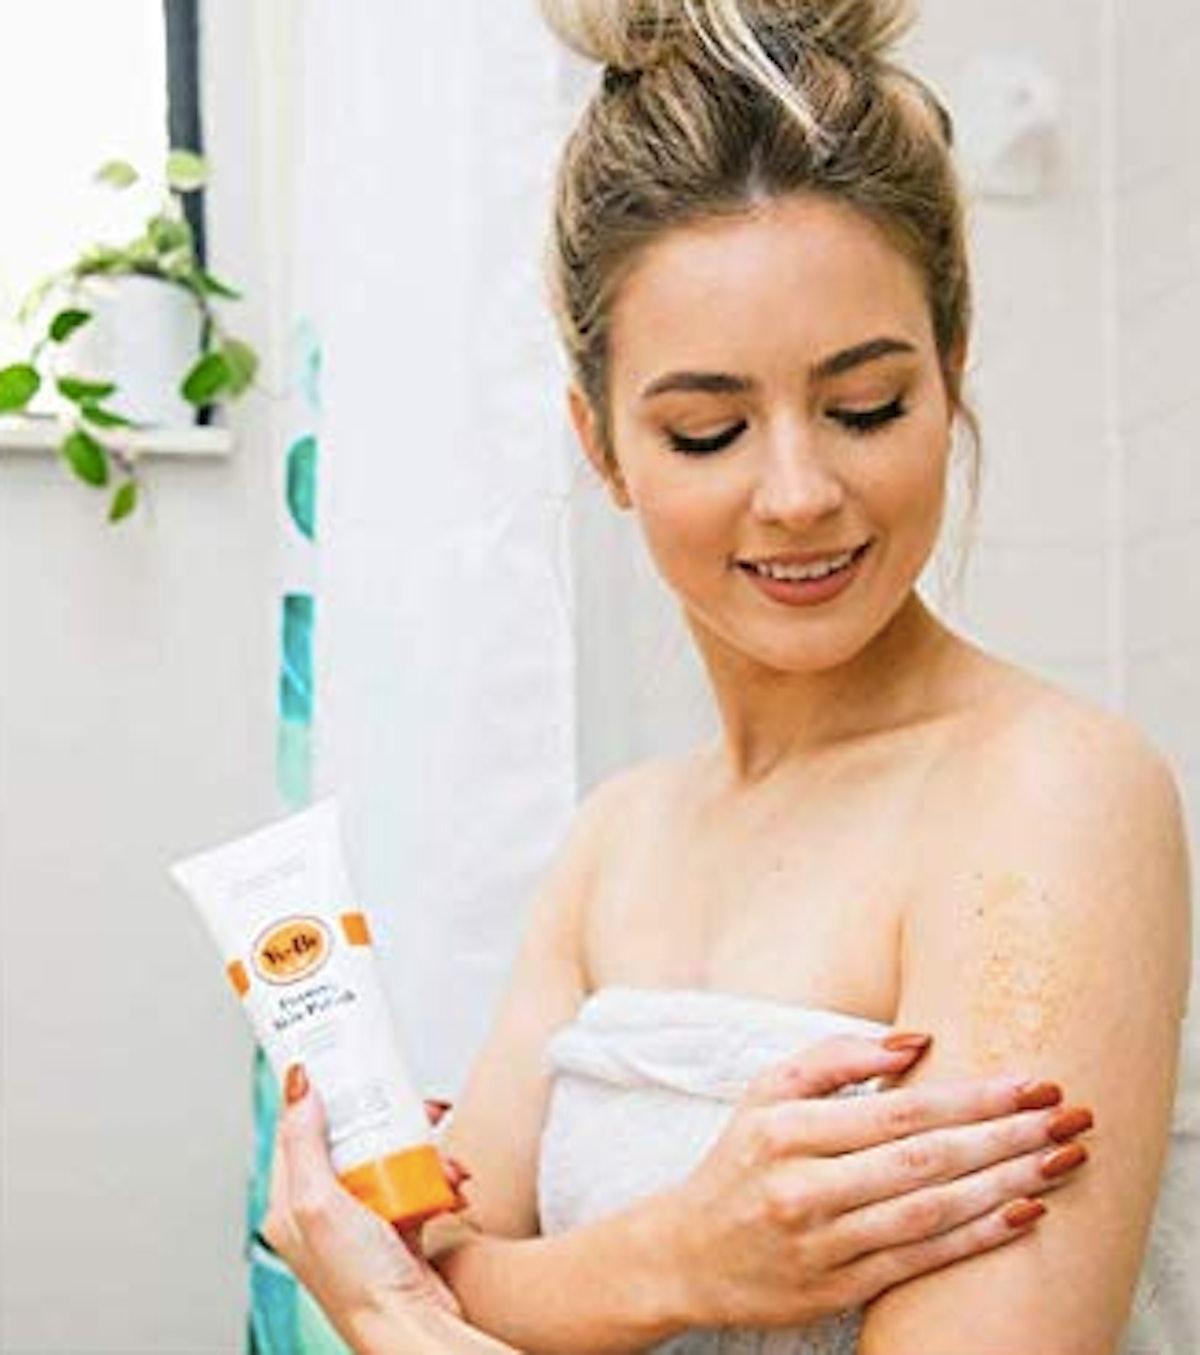 Yu-Be Foaming Exfoliating Face & Body Scrub